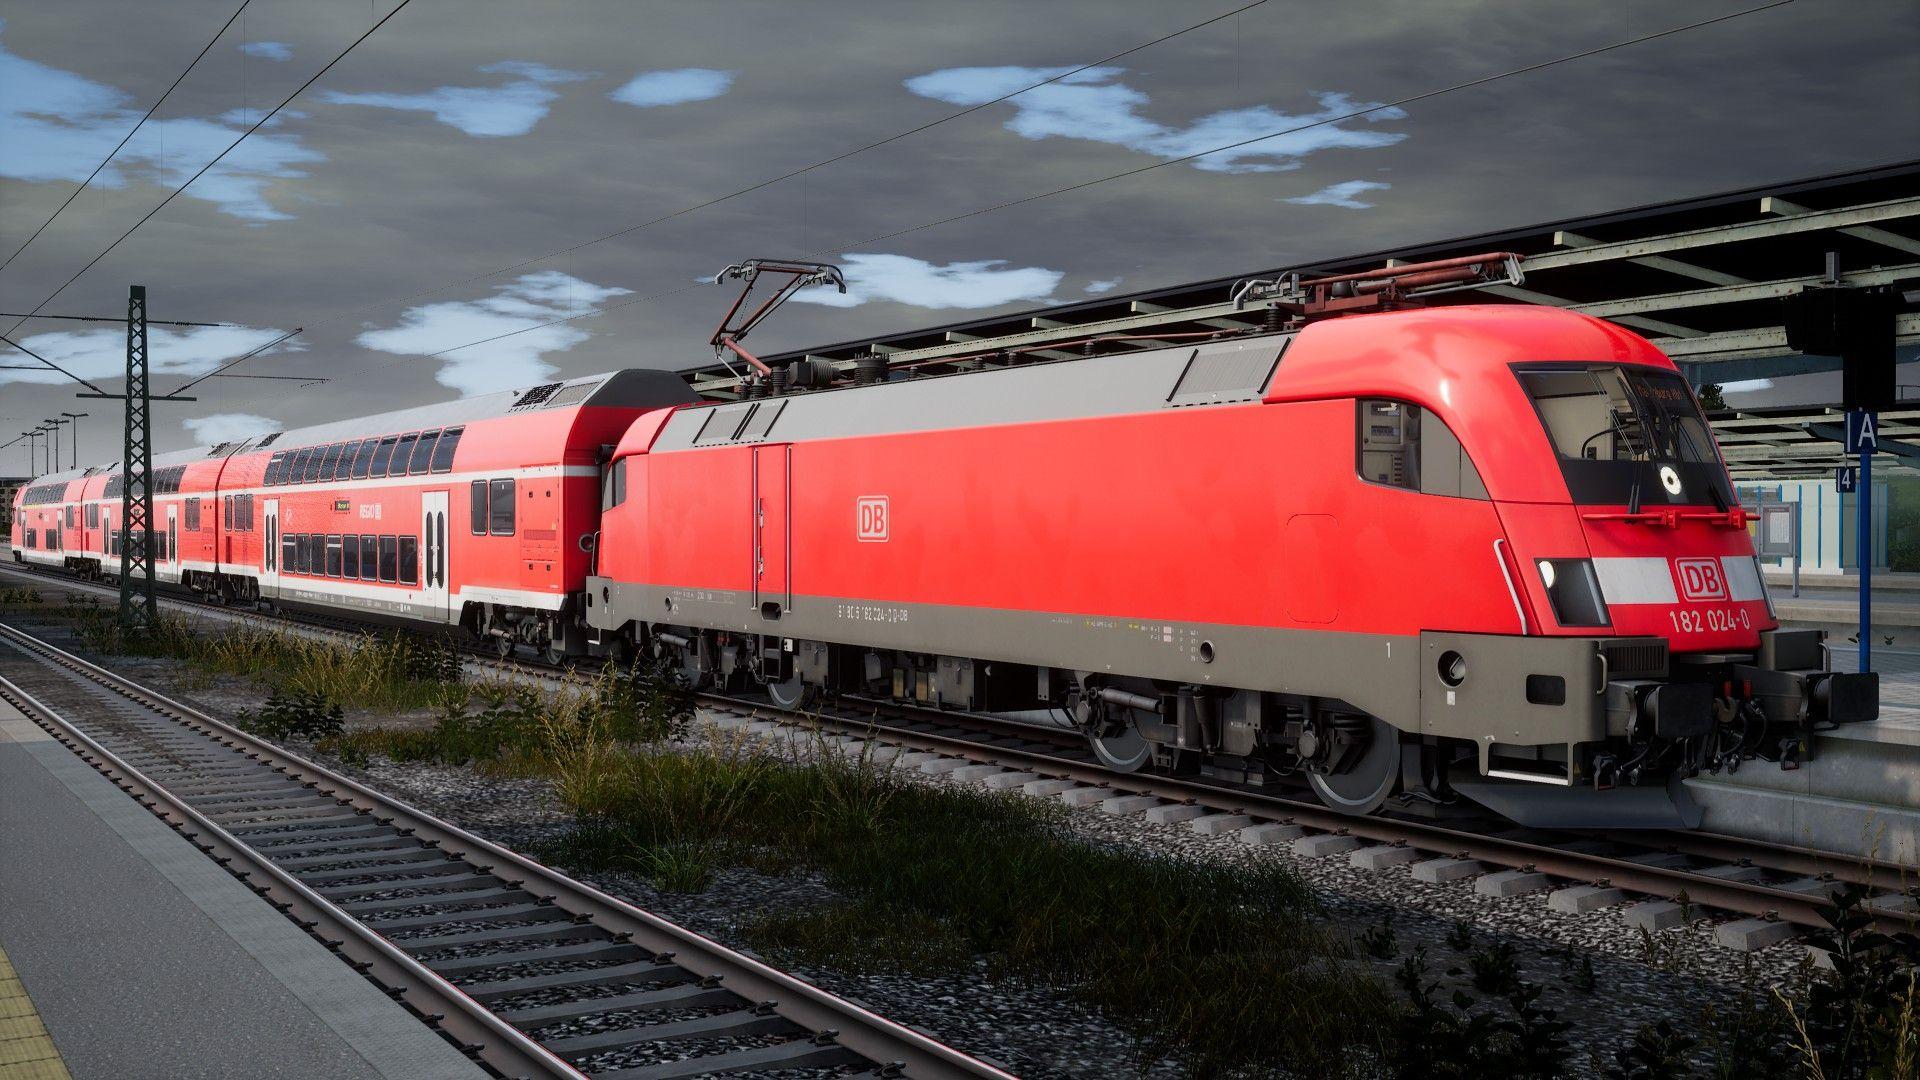 Review] Train Sim World: DB BR 182 Add-On - Rail-Sim de - Die Train